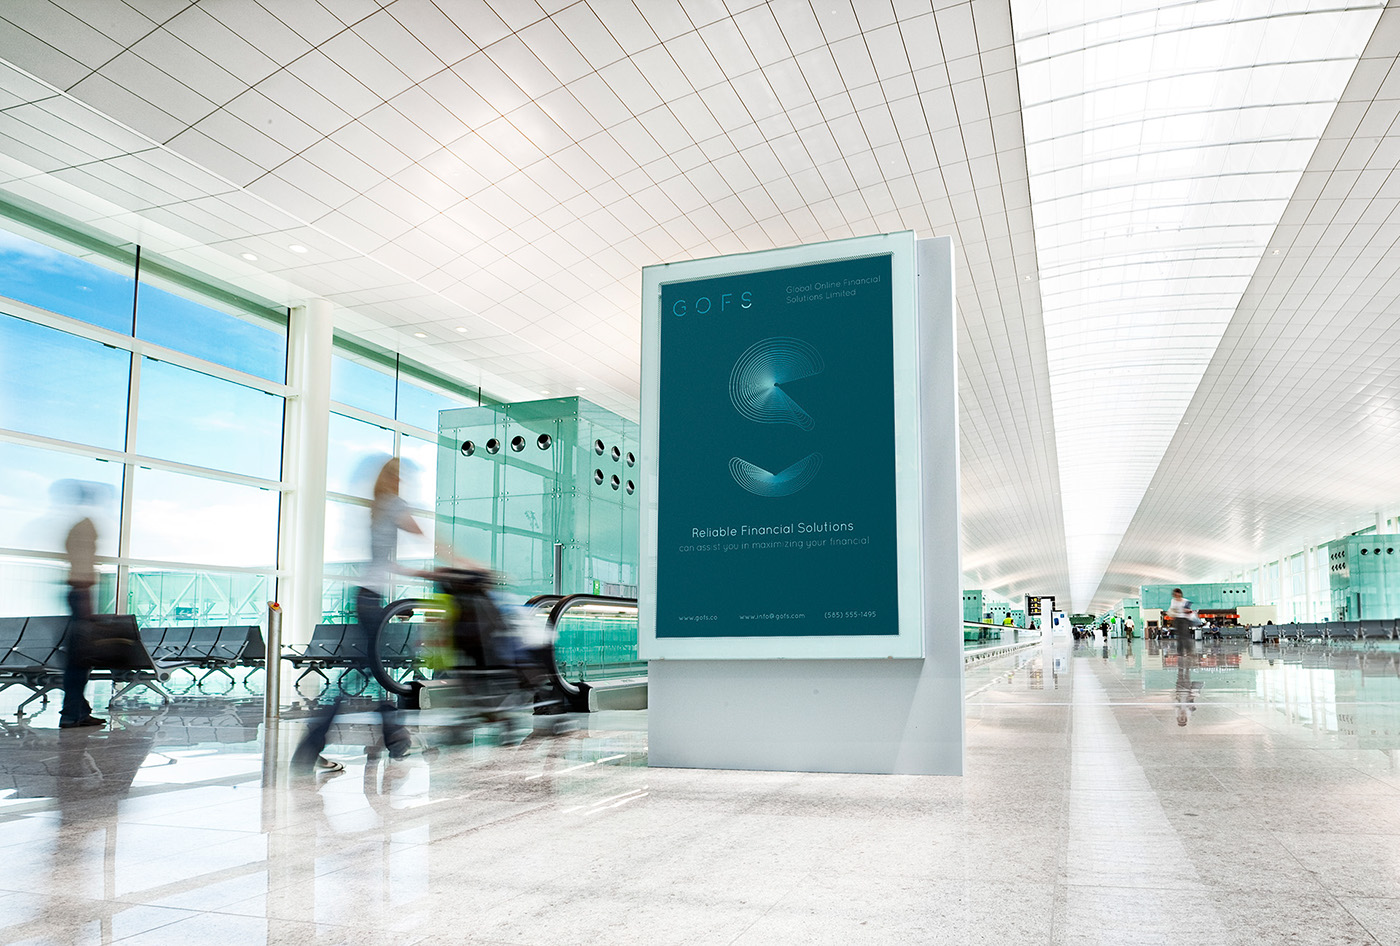 Global Online Financial 环球在线金融品牌视觉VI设计欣赏-VI设计公司10